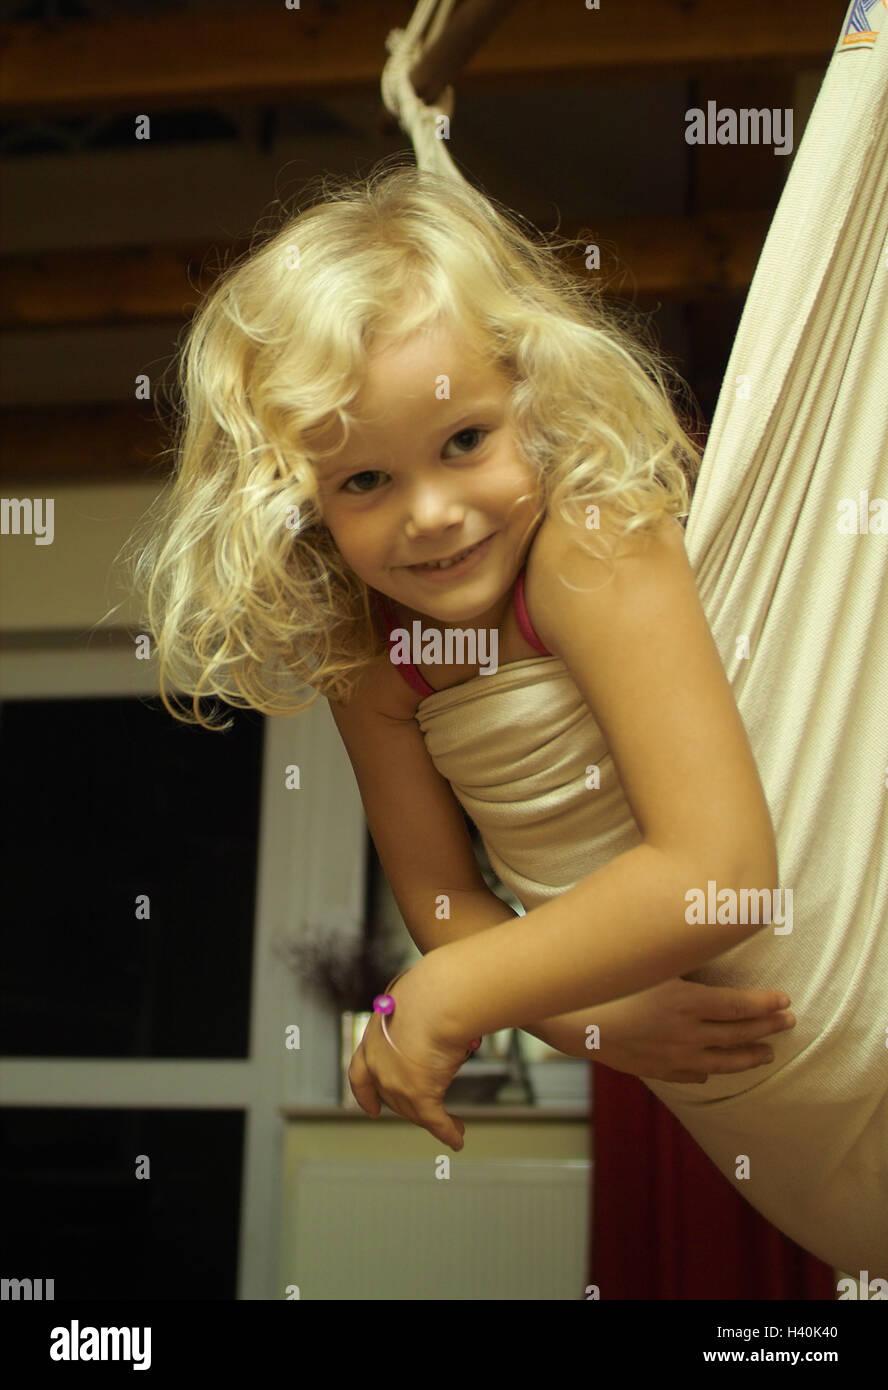 Terrace, hammock, girl, smile, child, 4 dangle - 6 years, childhood, leisure time, fun, hang, recreation, rest, - Stock Image